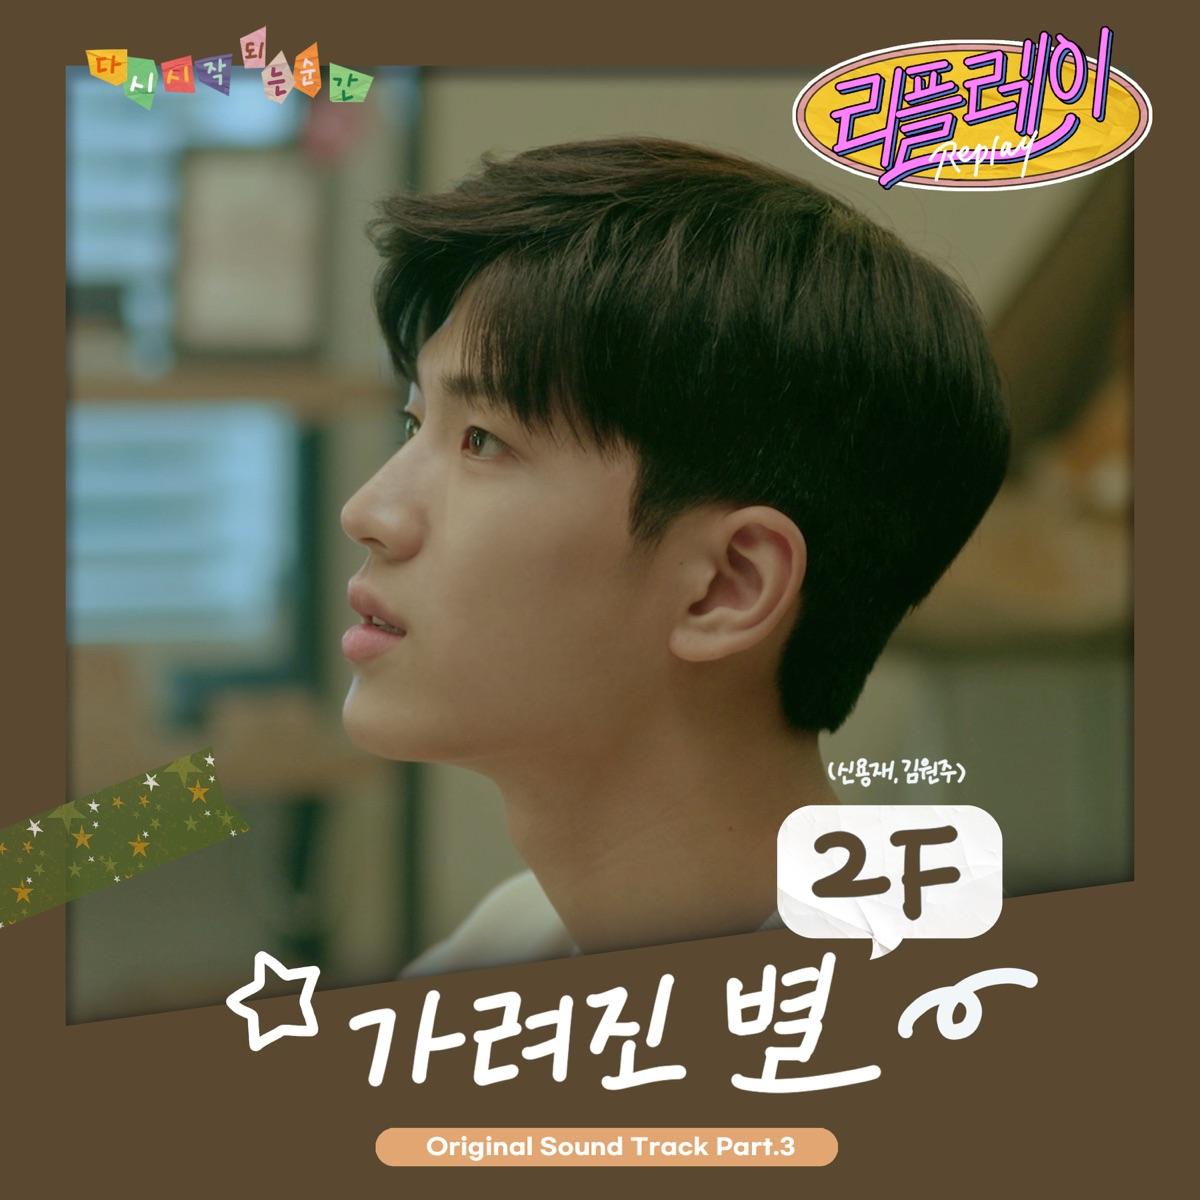 『2F (SHIN YONG JAE & KIM WON JOO) - Hidden Star』収録の『Replay (Original Television Soundtrack) Pt. 3』ジャケット